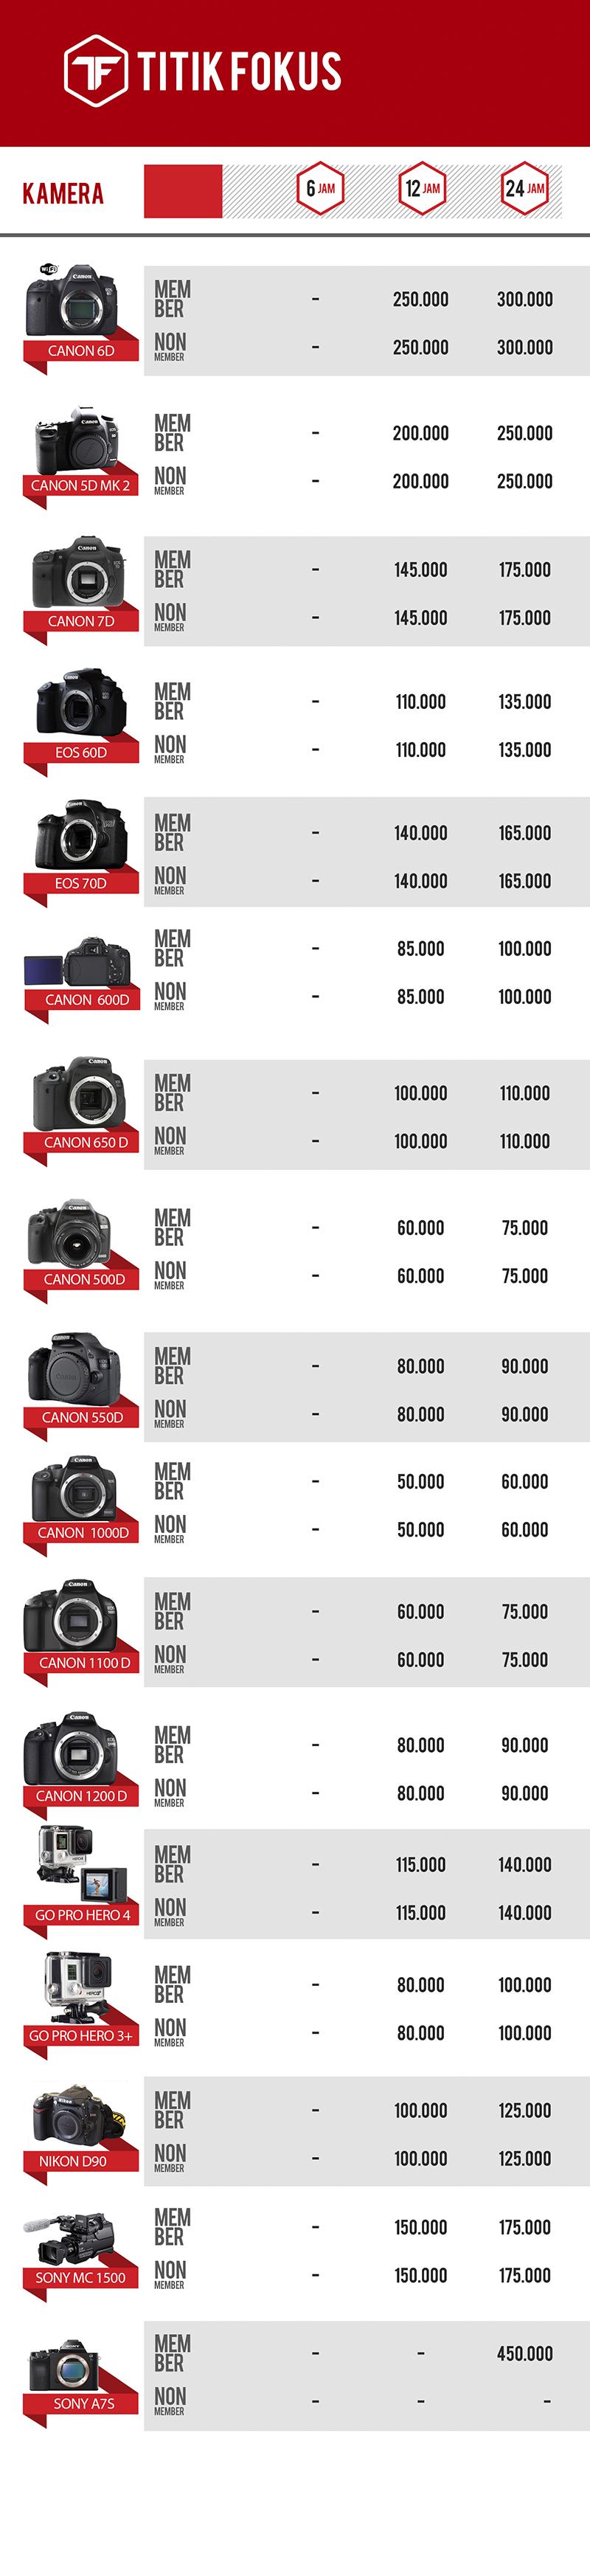 harga sewa lensa kamera titik fokus bandung